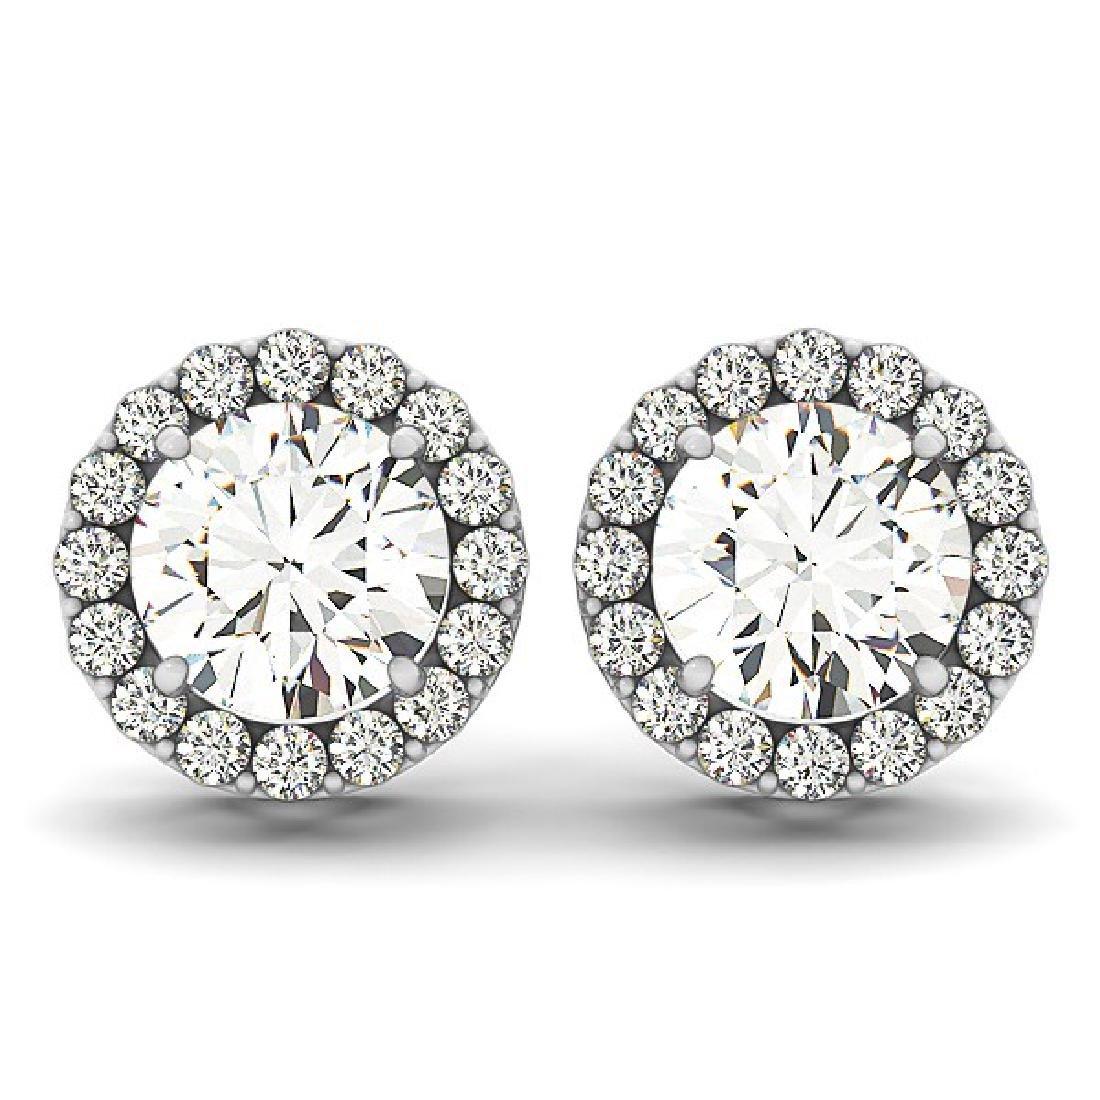 4.40 CTW Diamond Solitaire Earrings VS/SI Certified 14K - 2